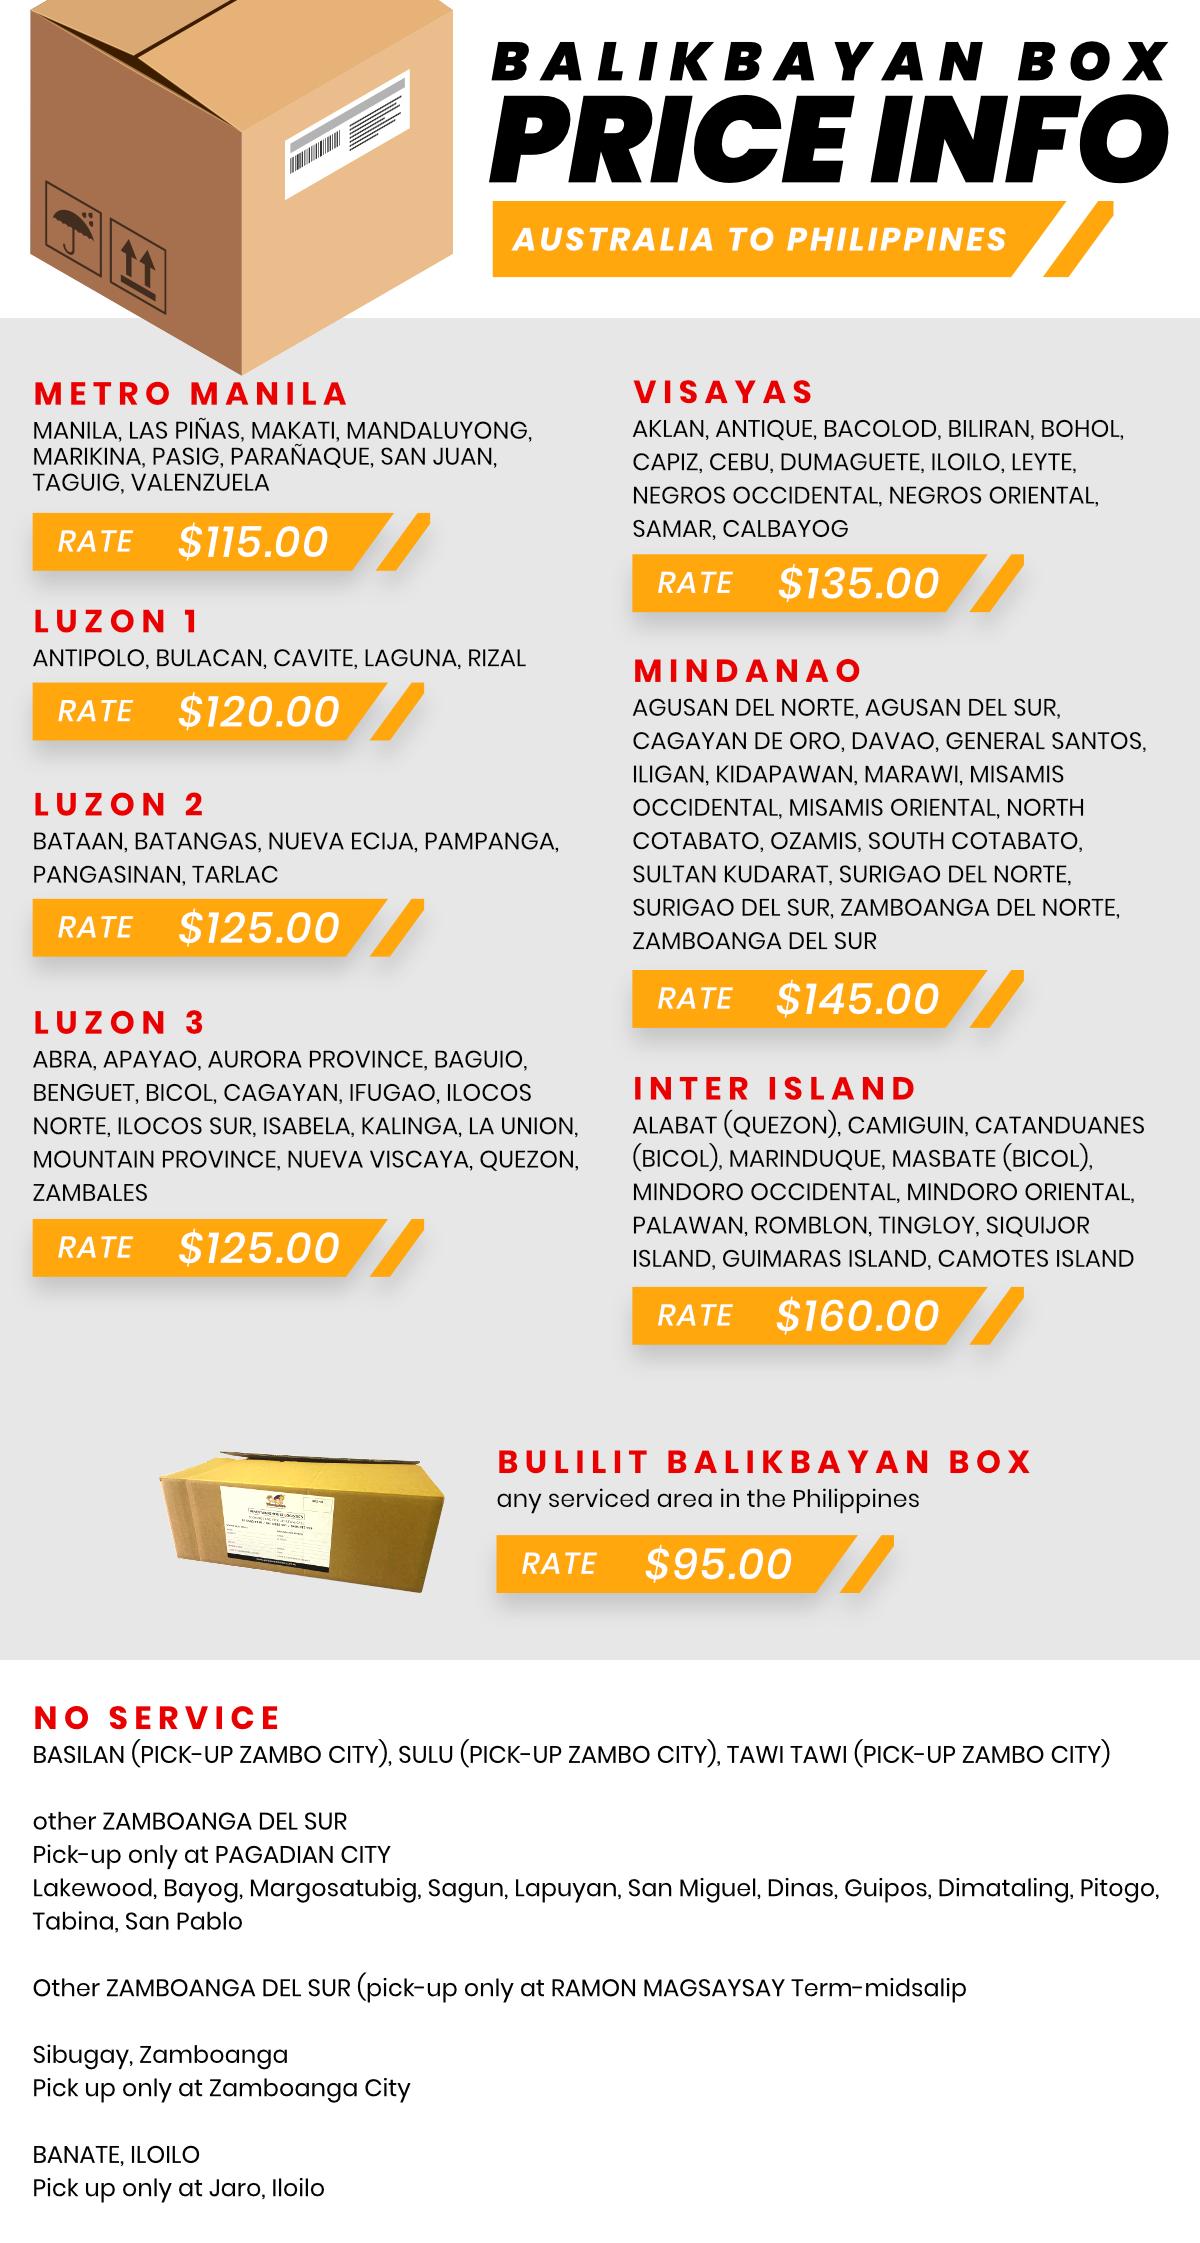 balikbayan-box-price-info-v4